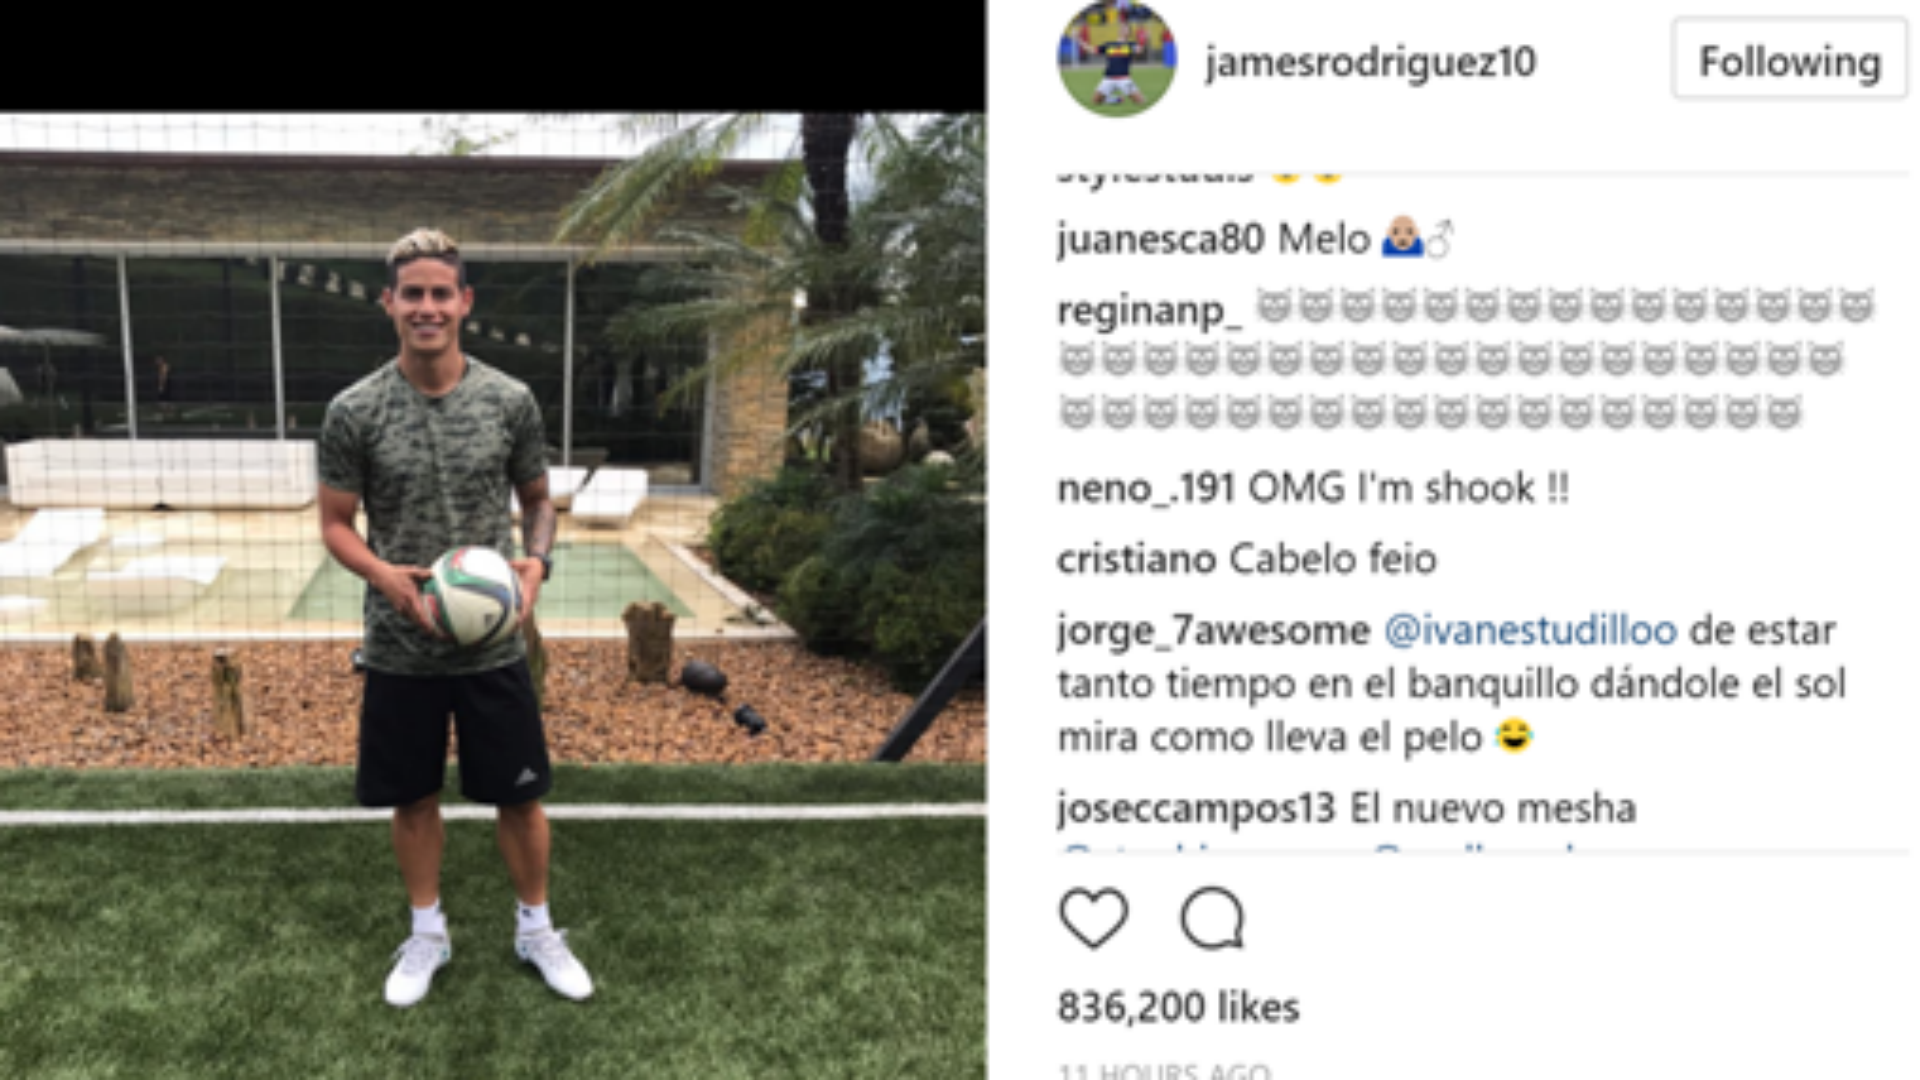 James Rodriguez Cristiano Ronaldo hair